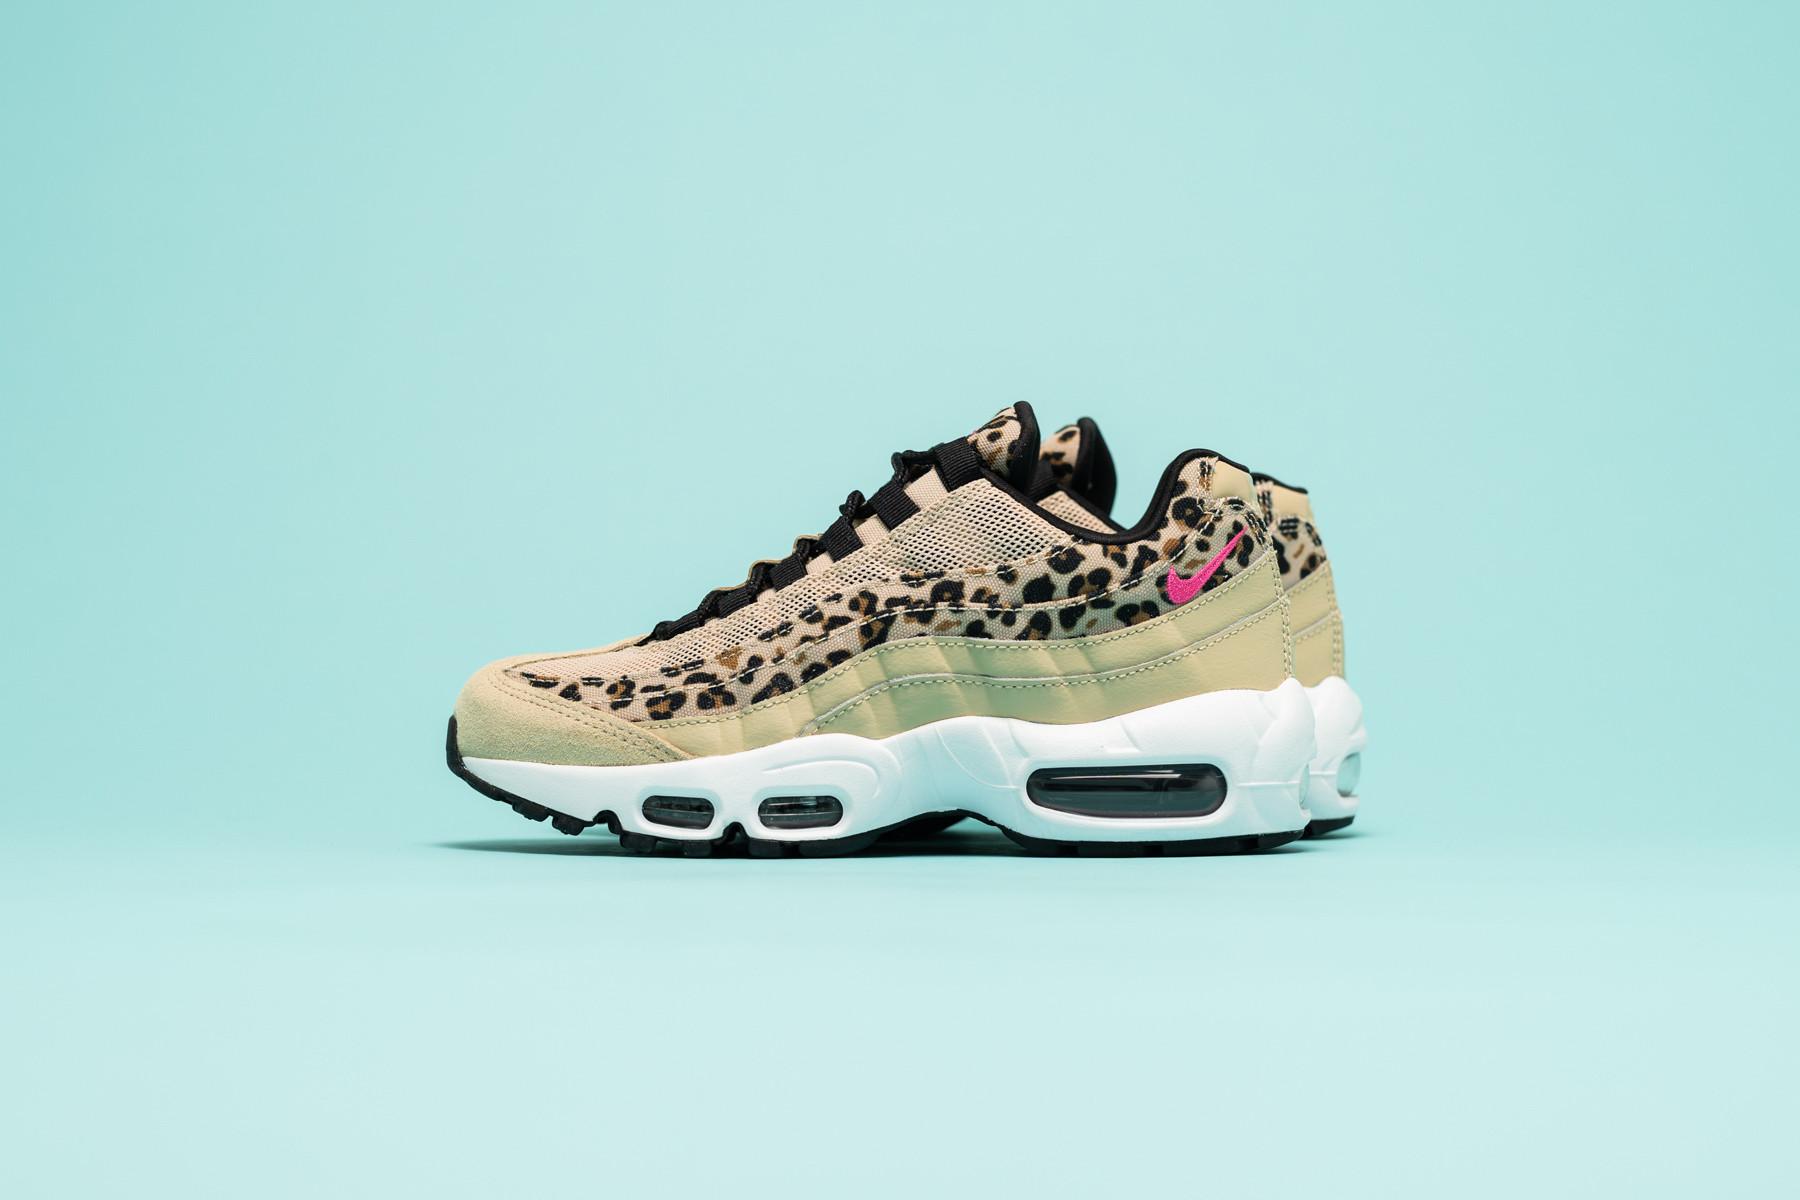 Nike Air Max 95 Leopard Print Damen CD0180 200 |